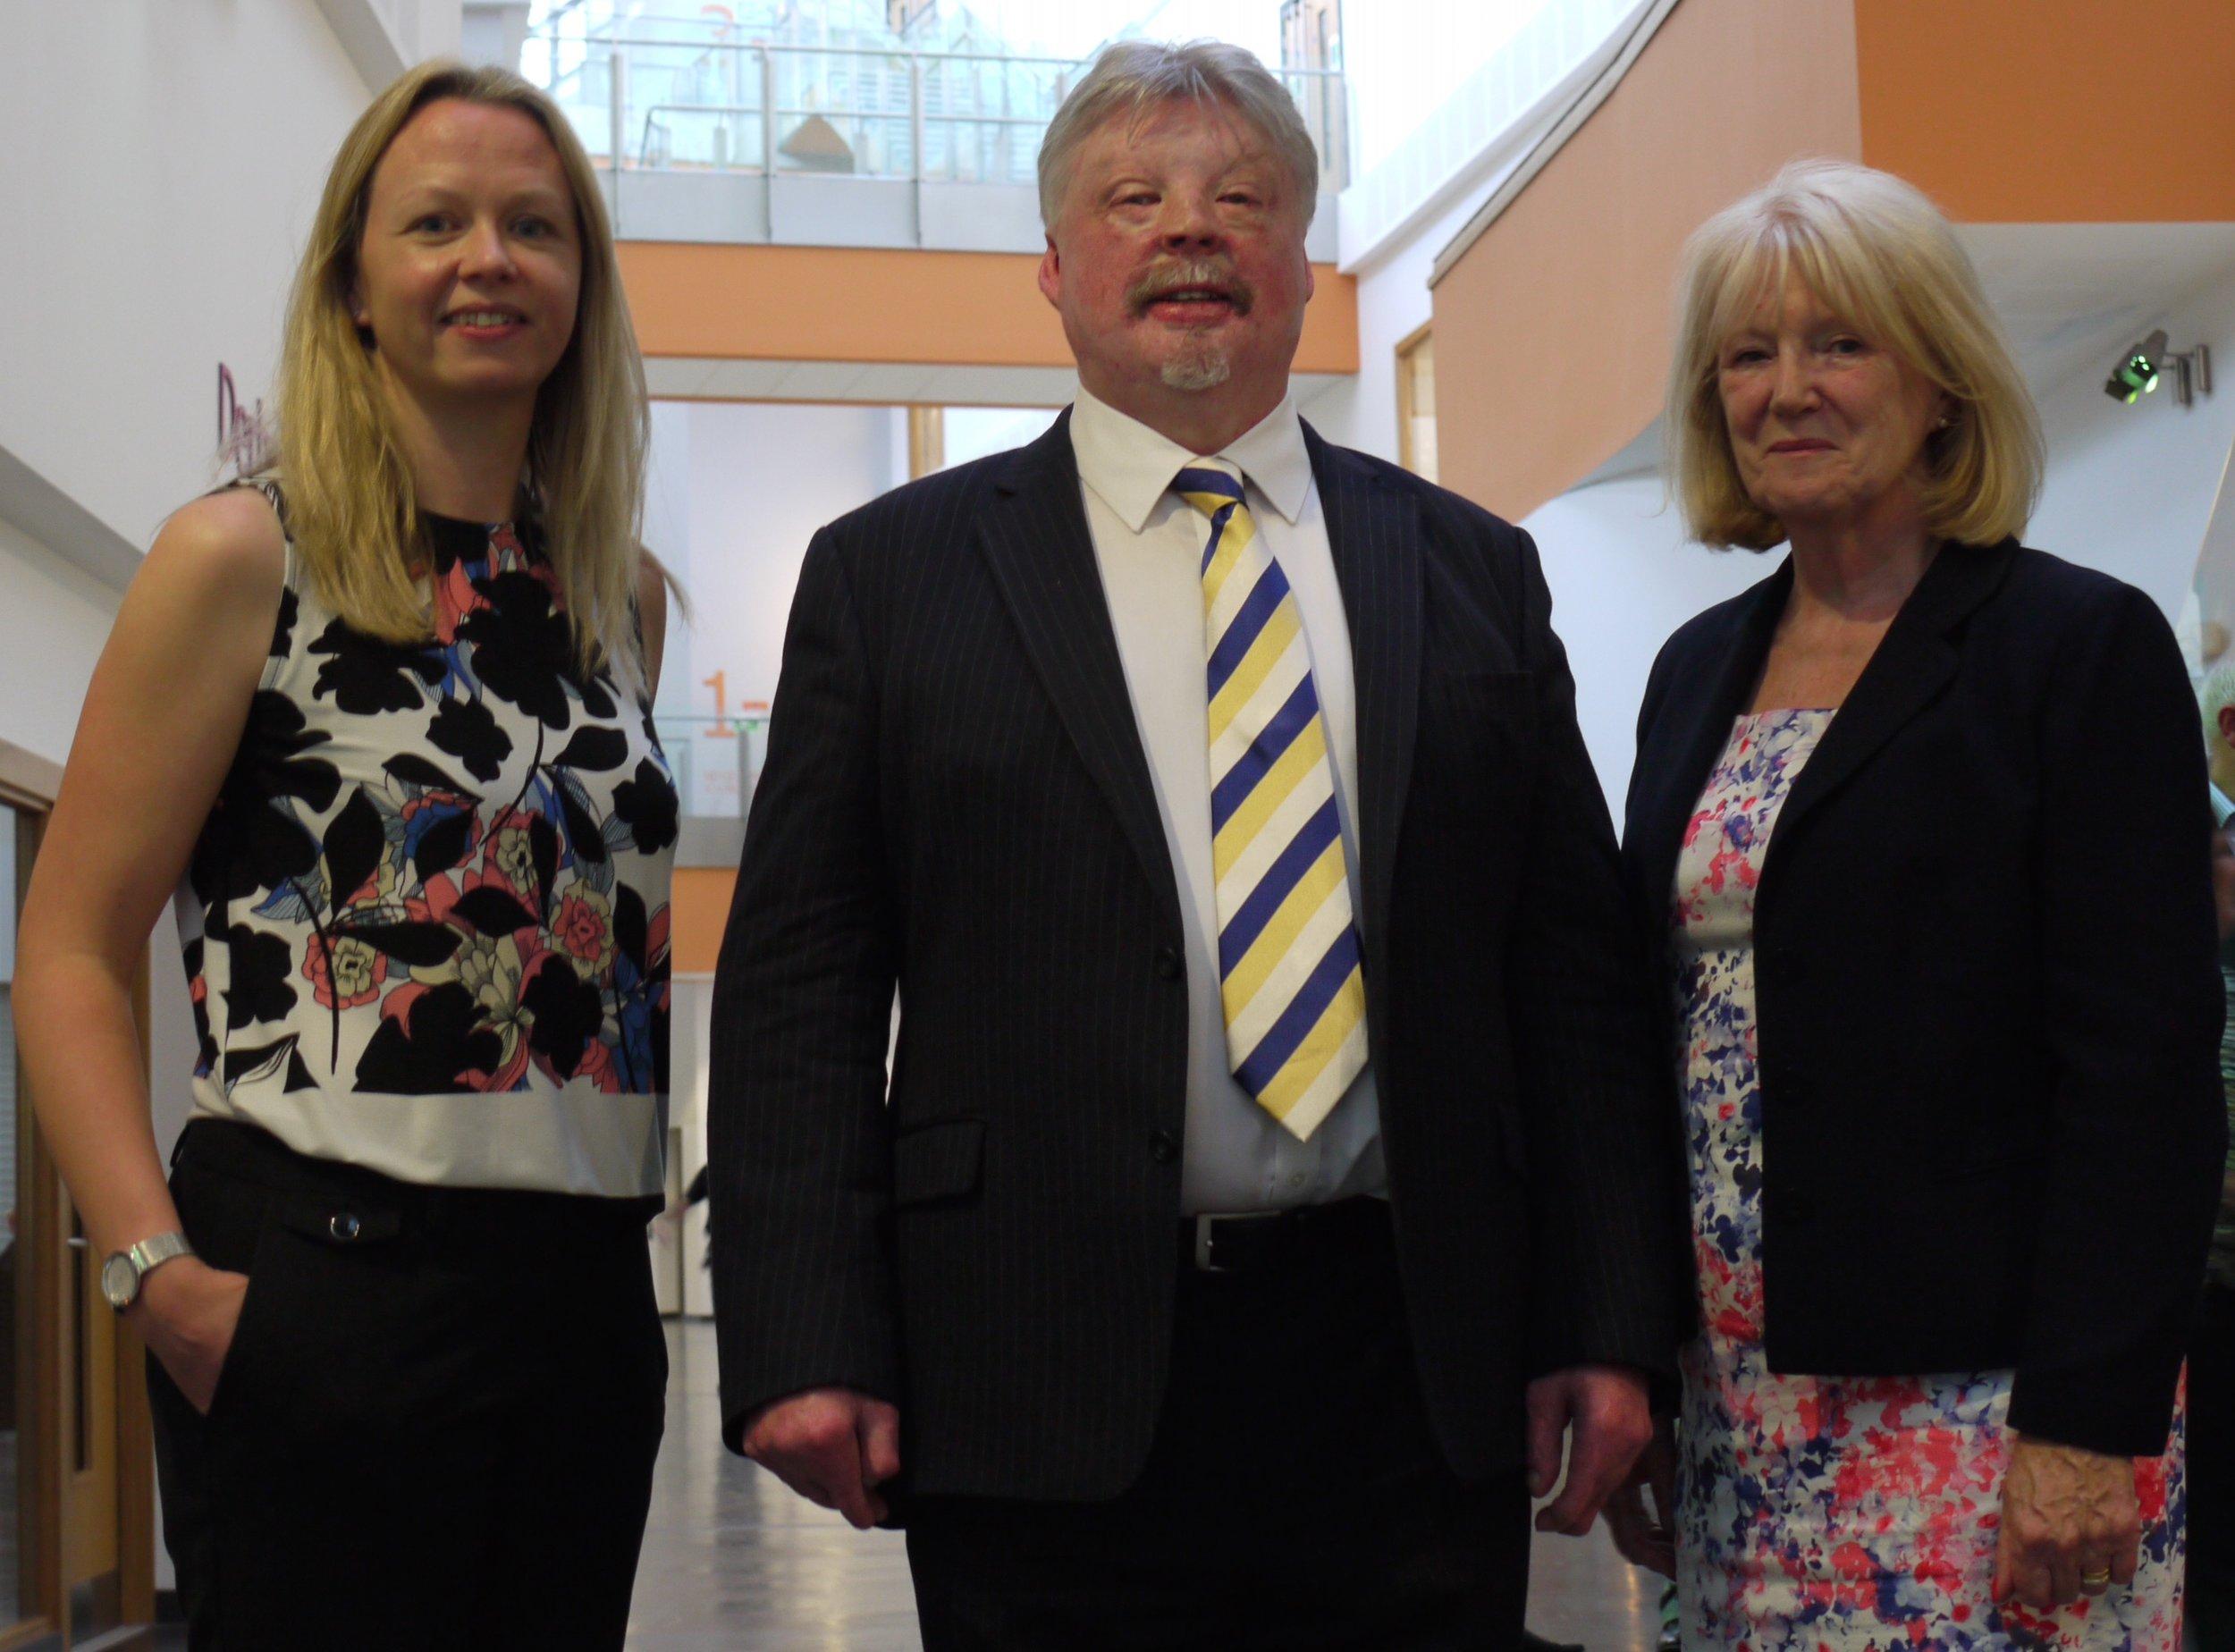 (From L-R) Liz Brookes - Forum Coordinator, Simon Weston CBE - Speaker, Denise Lovering - Chair of Caerphilly Business Forum